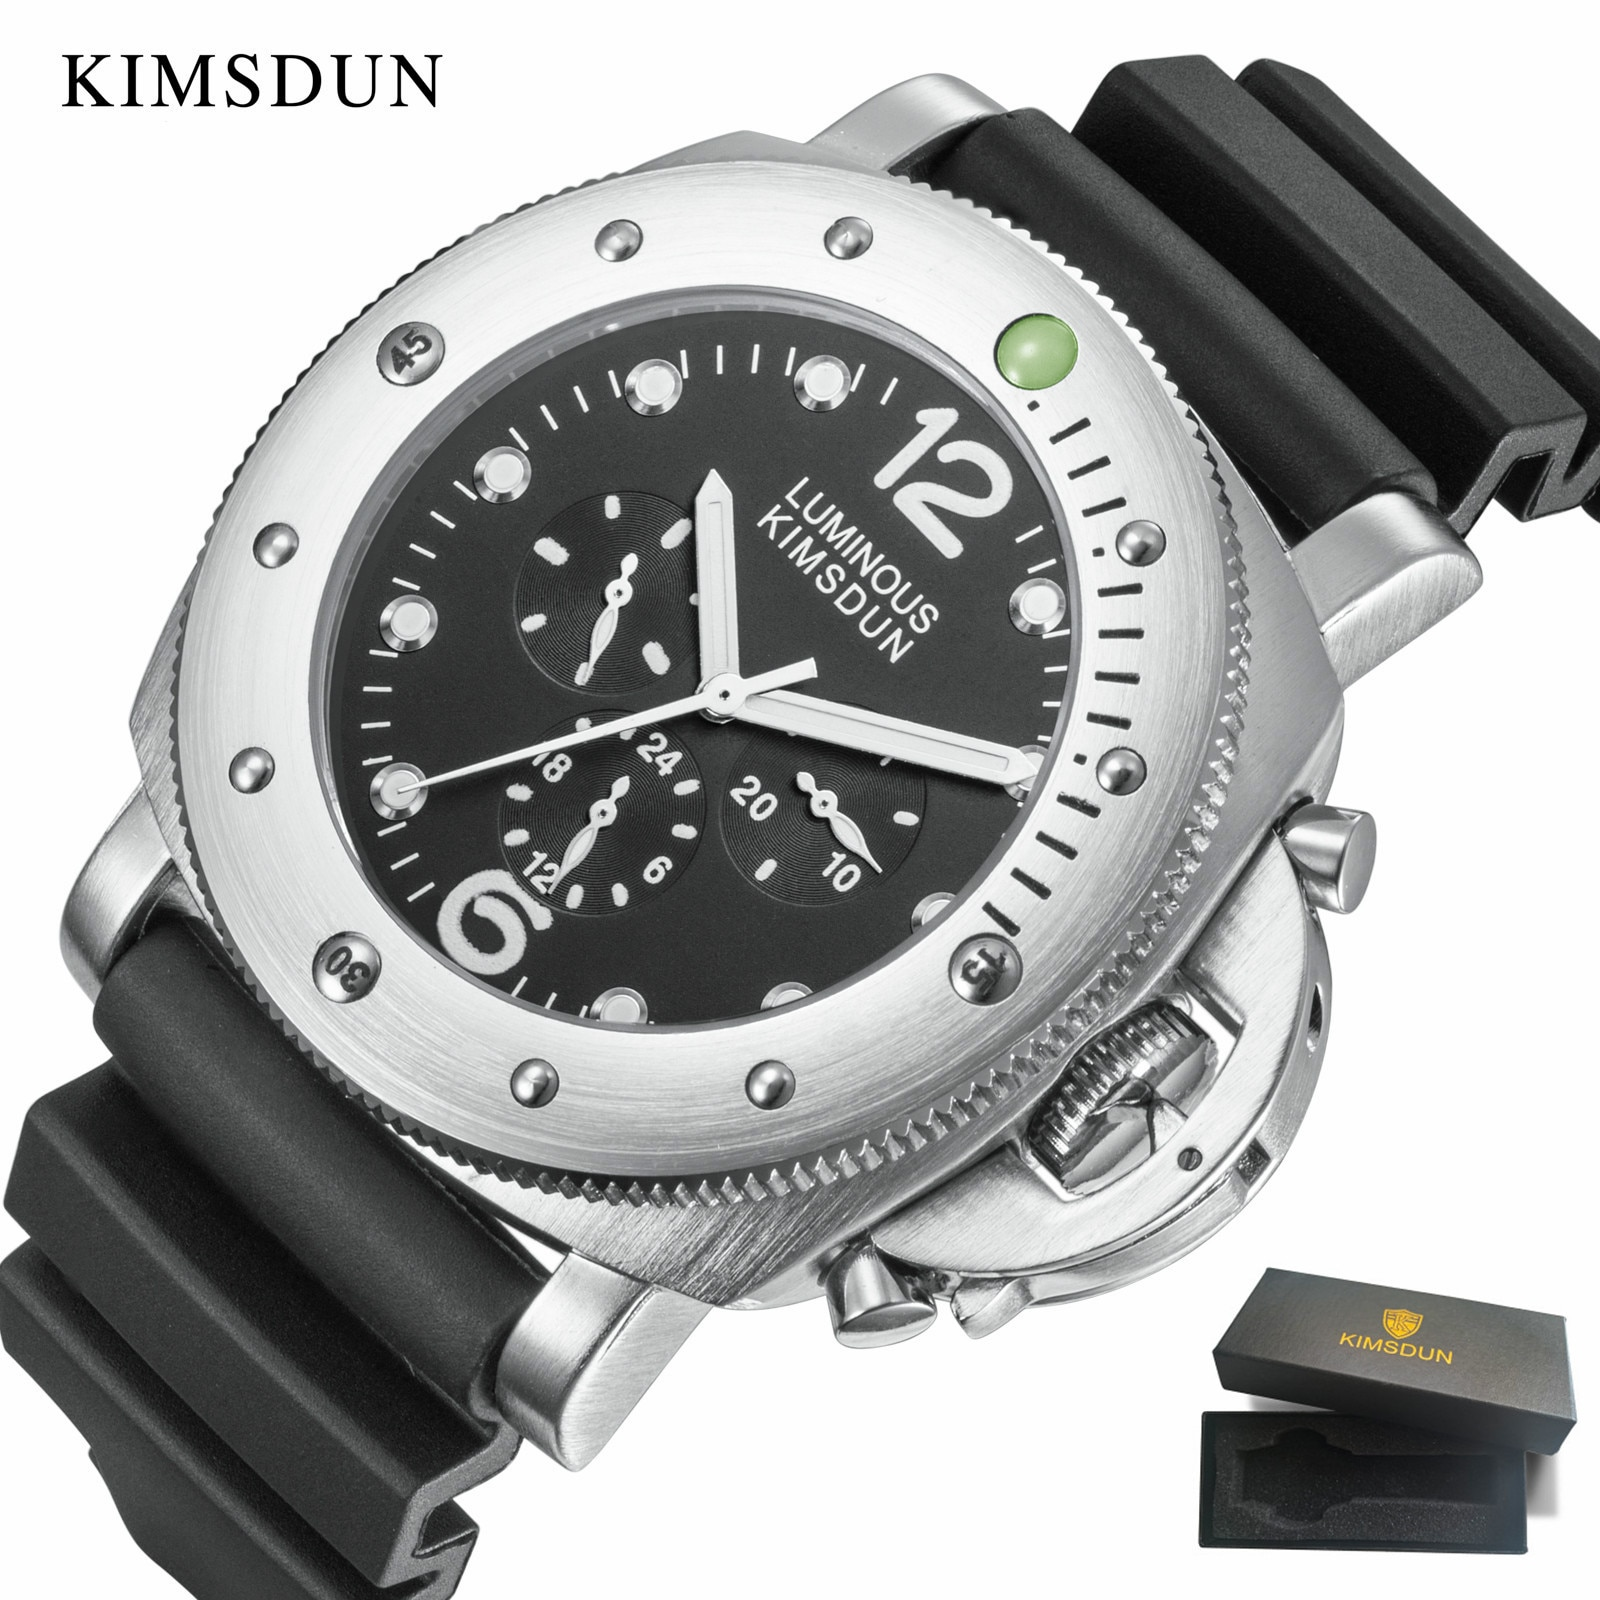 Relogio KIMSDUN العلامة التجارية الكلاسيكية الرجال الاتجاه الفاخرة عادية التلقائي الميكانيكية الرياضة موضة ساعة كبيرة سيليكون حزام العسكرية